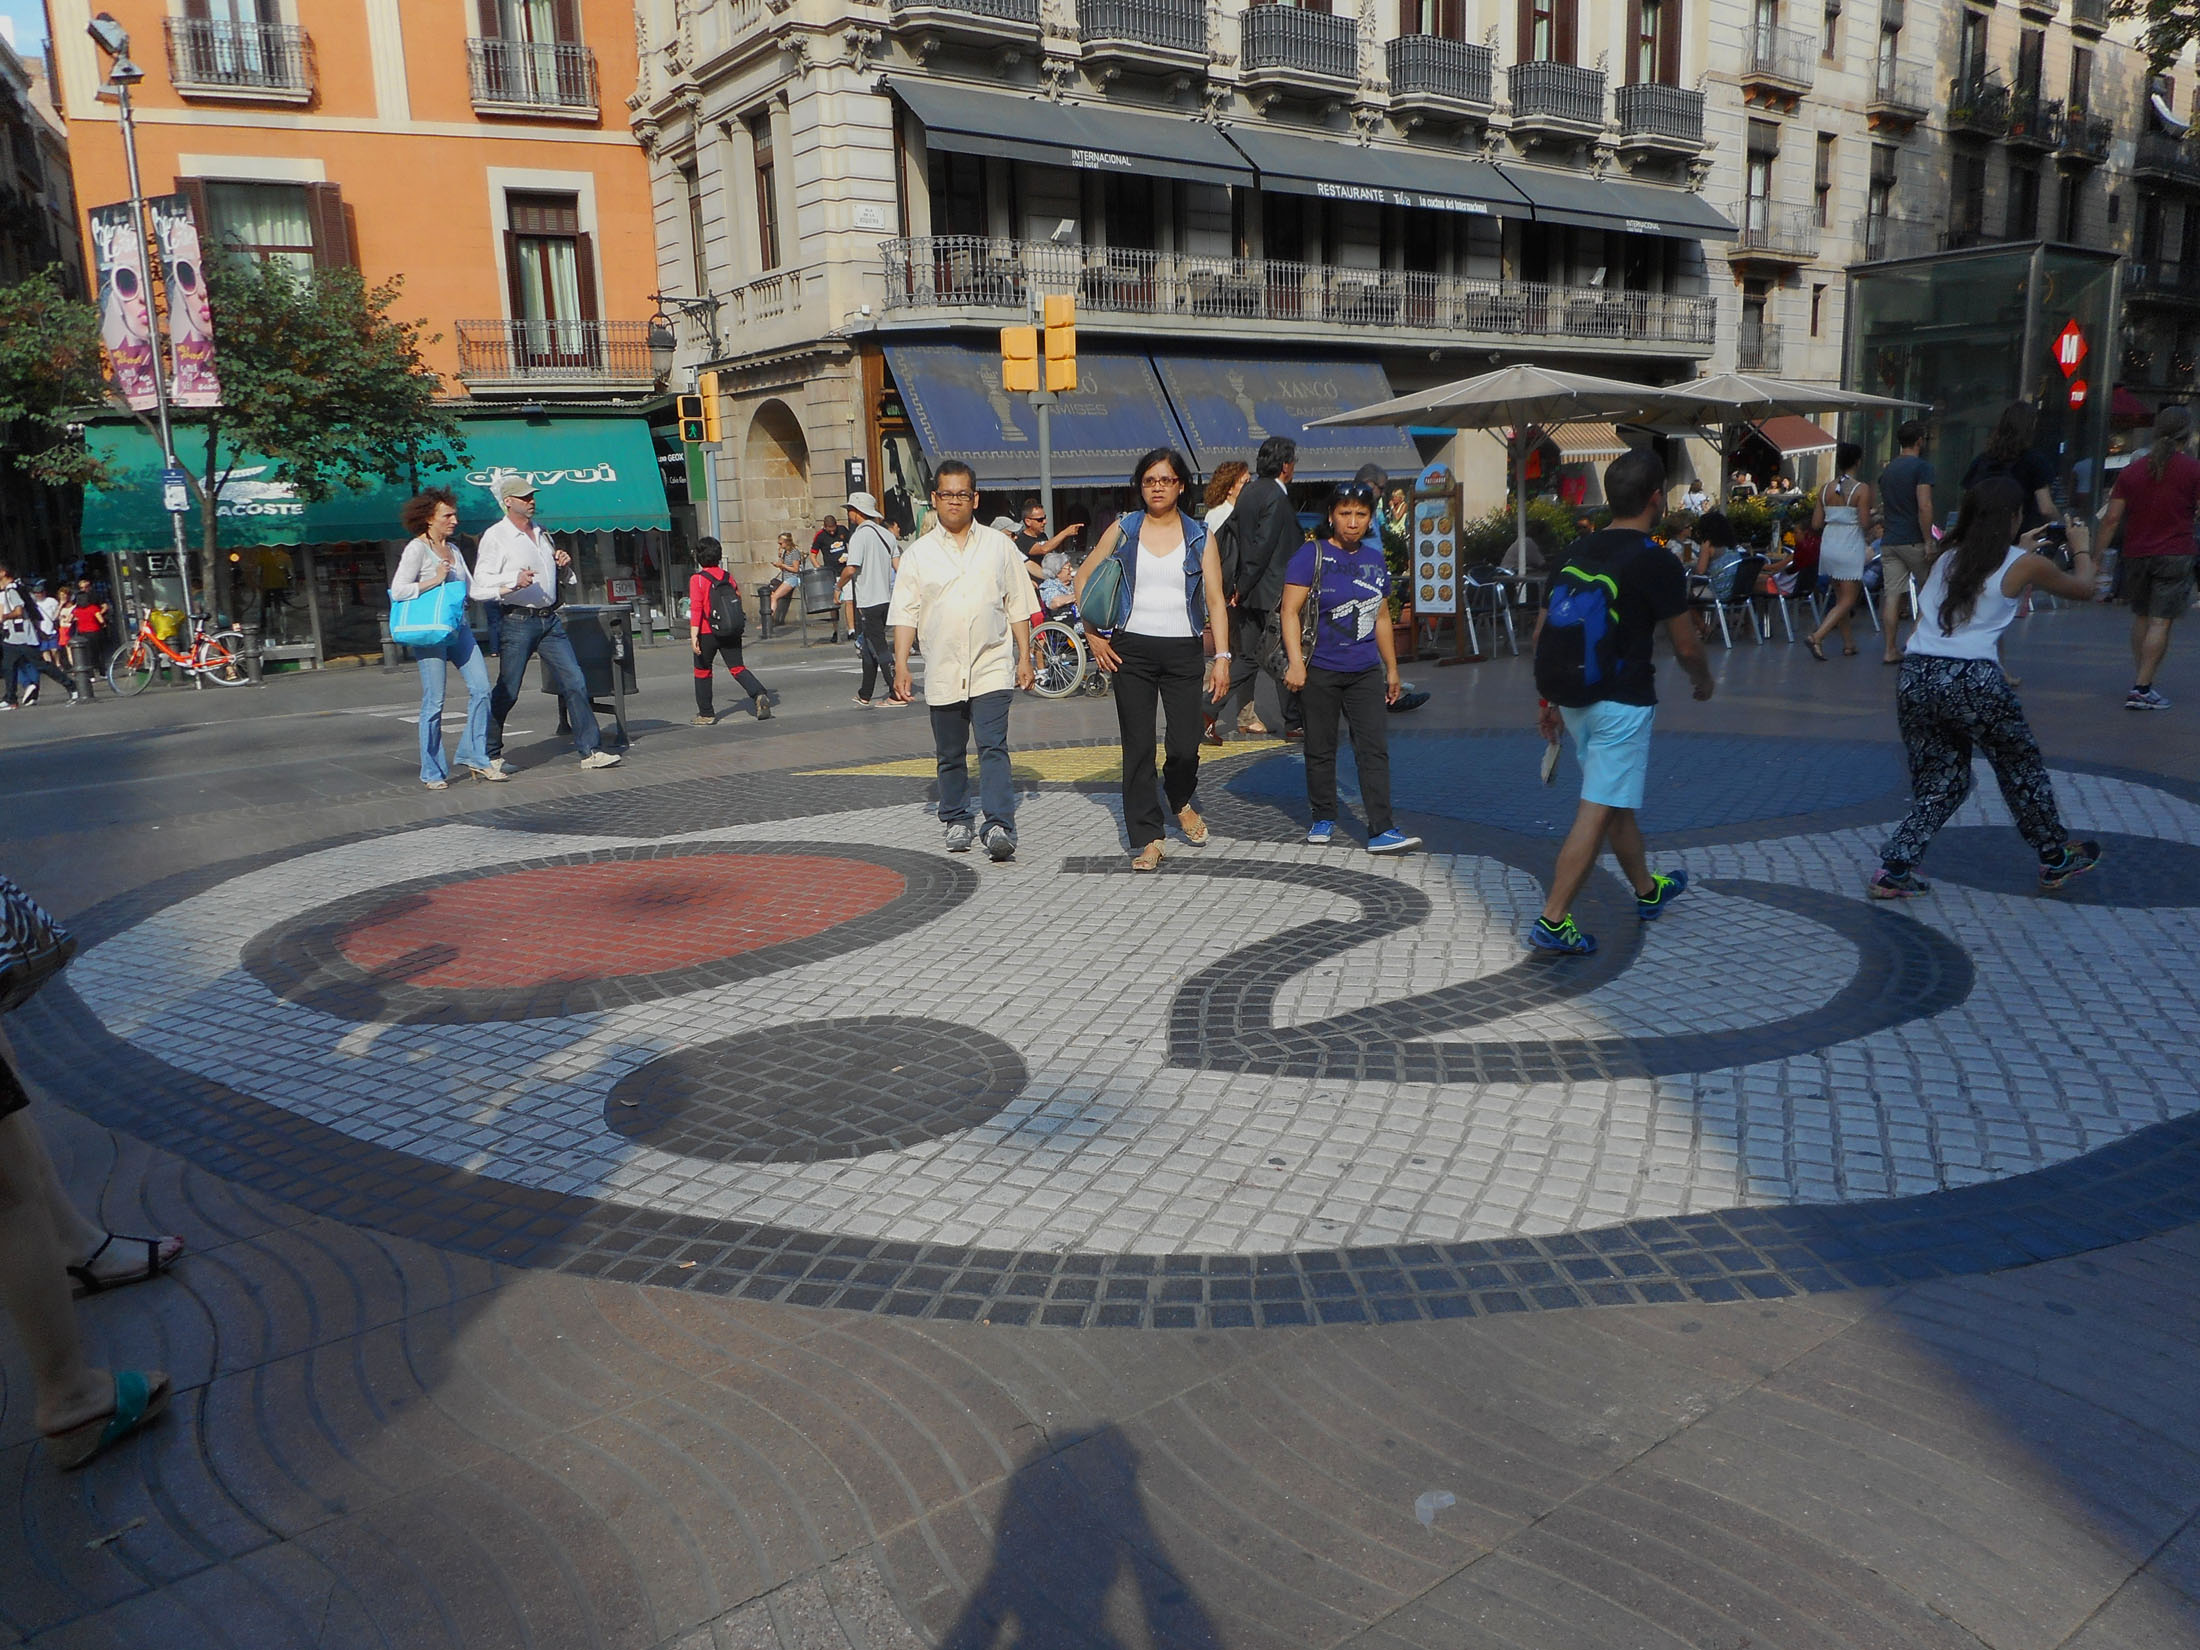 barcelona-las-ramblas-miro-mural